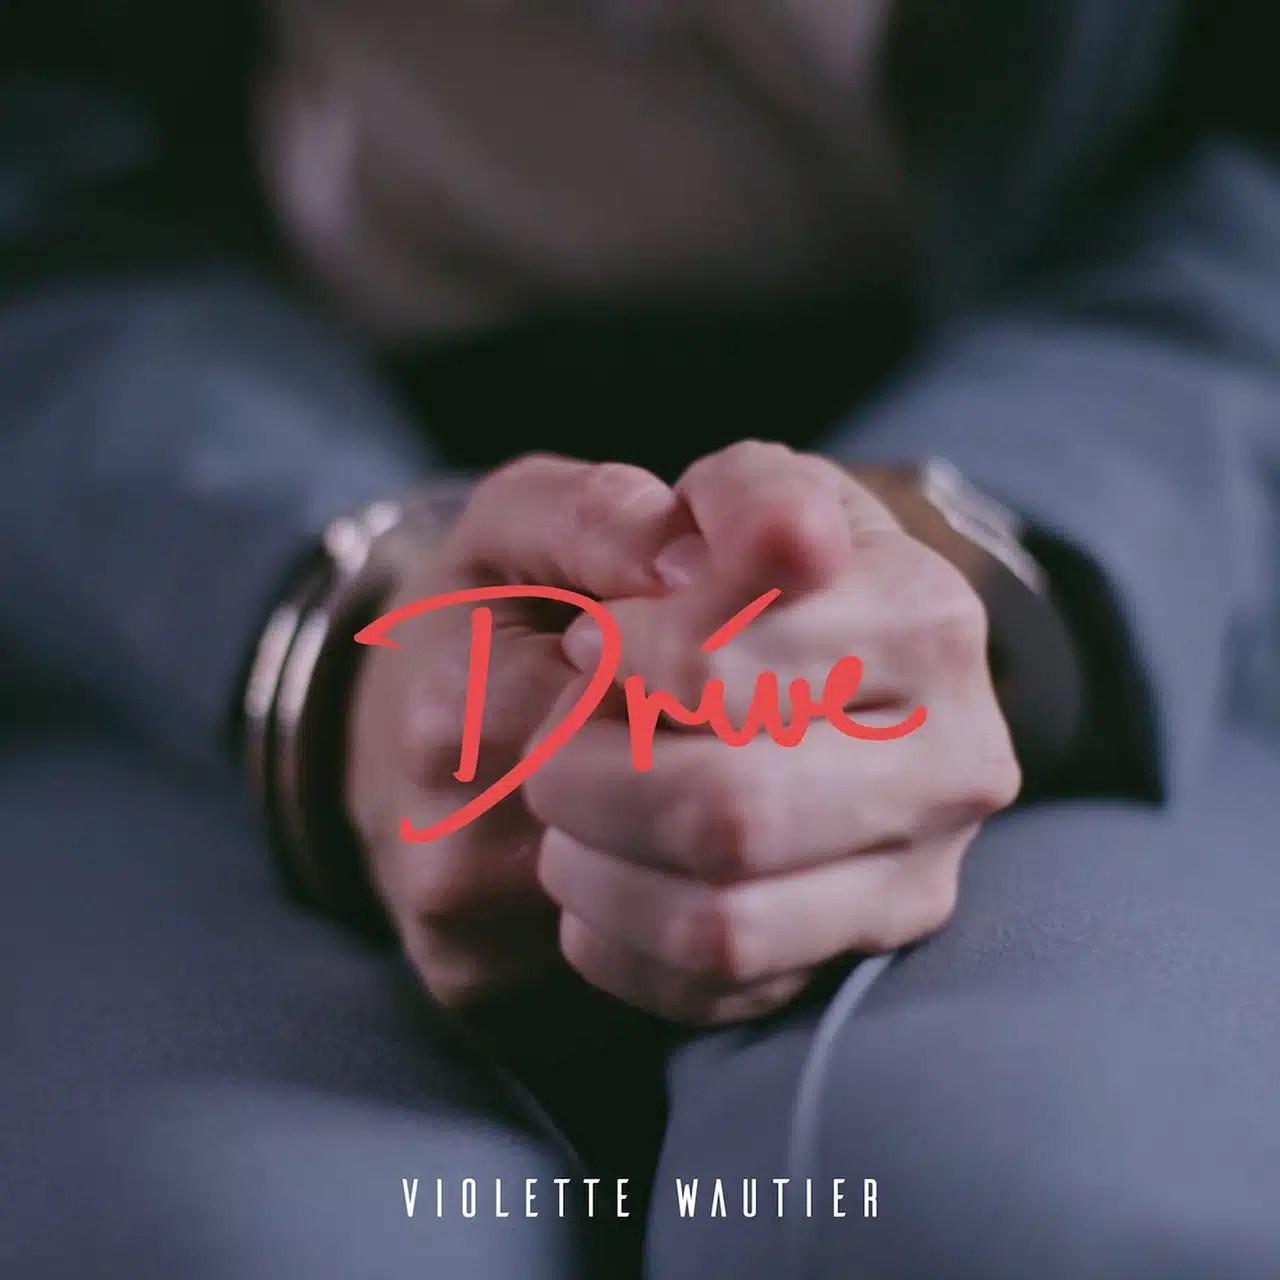 Violette Wautier - Drive # lyrics 中文歌詞 @ Toi la Vien :: 痞客邦